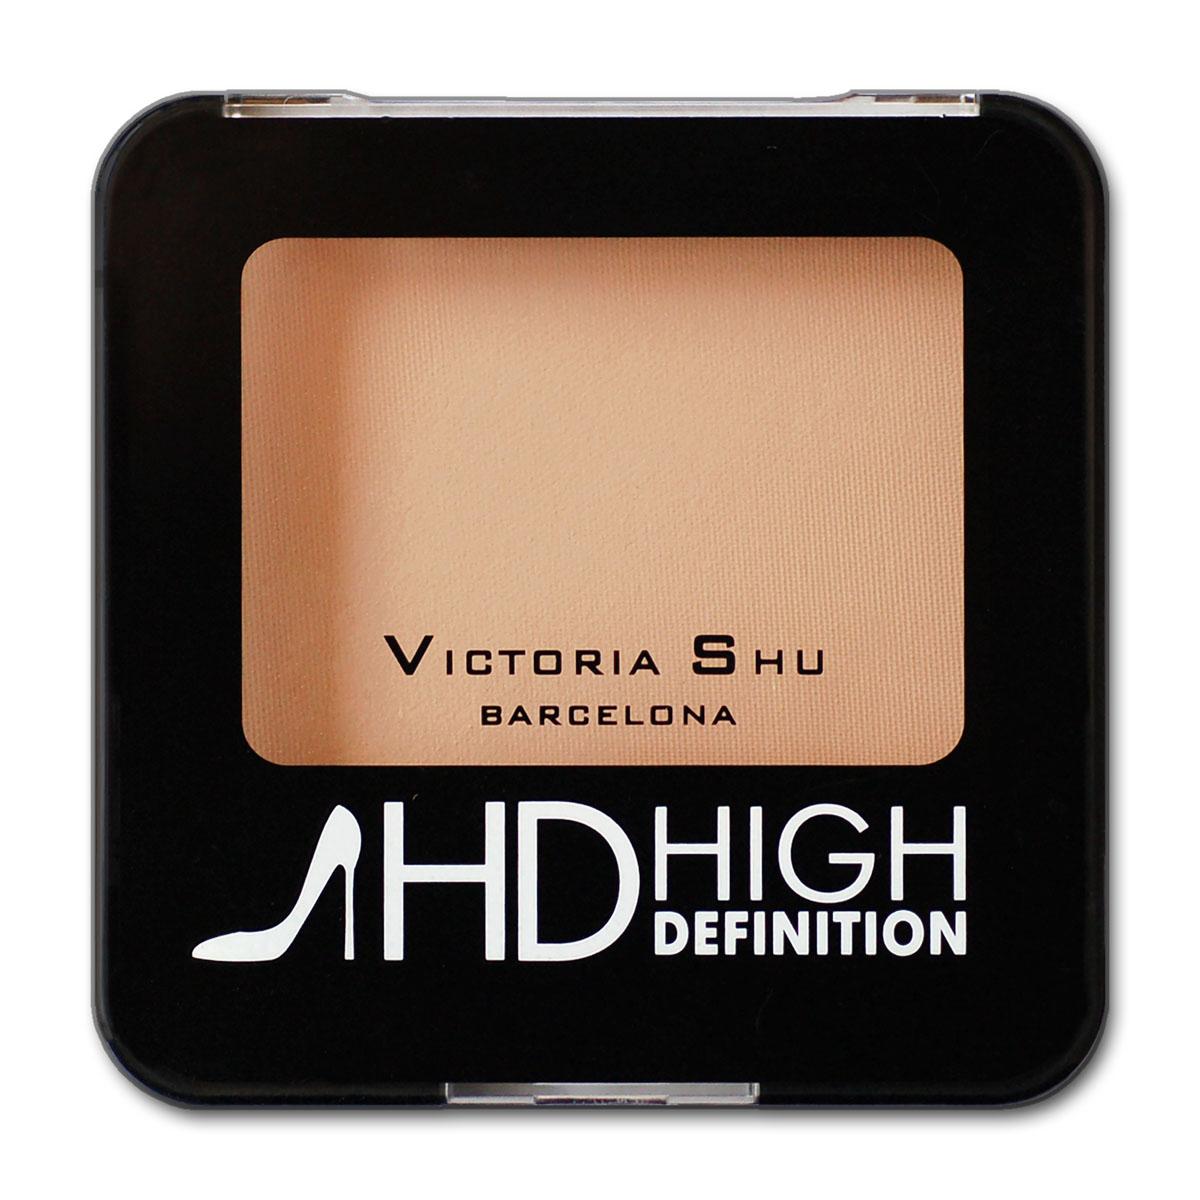 Victoria Shu Пудра компактная High Definition №314